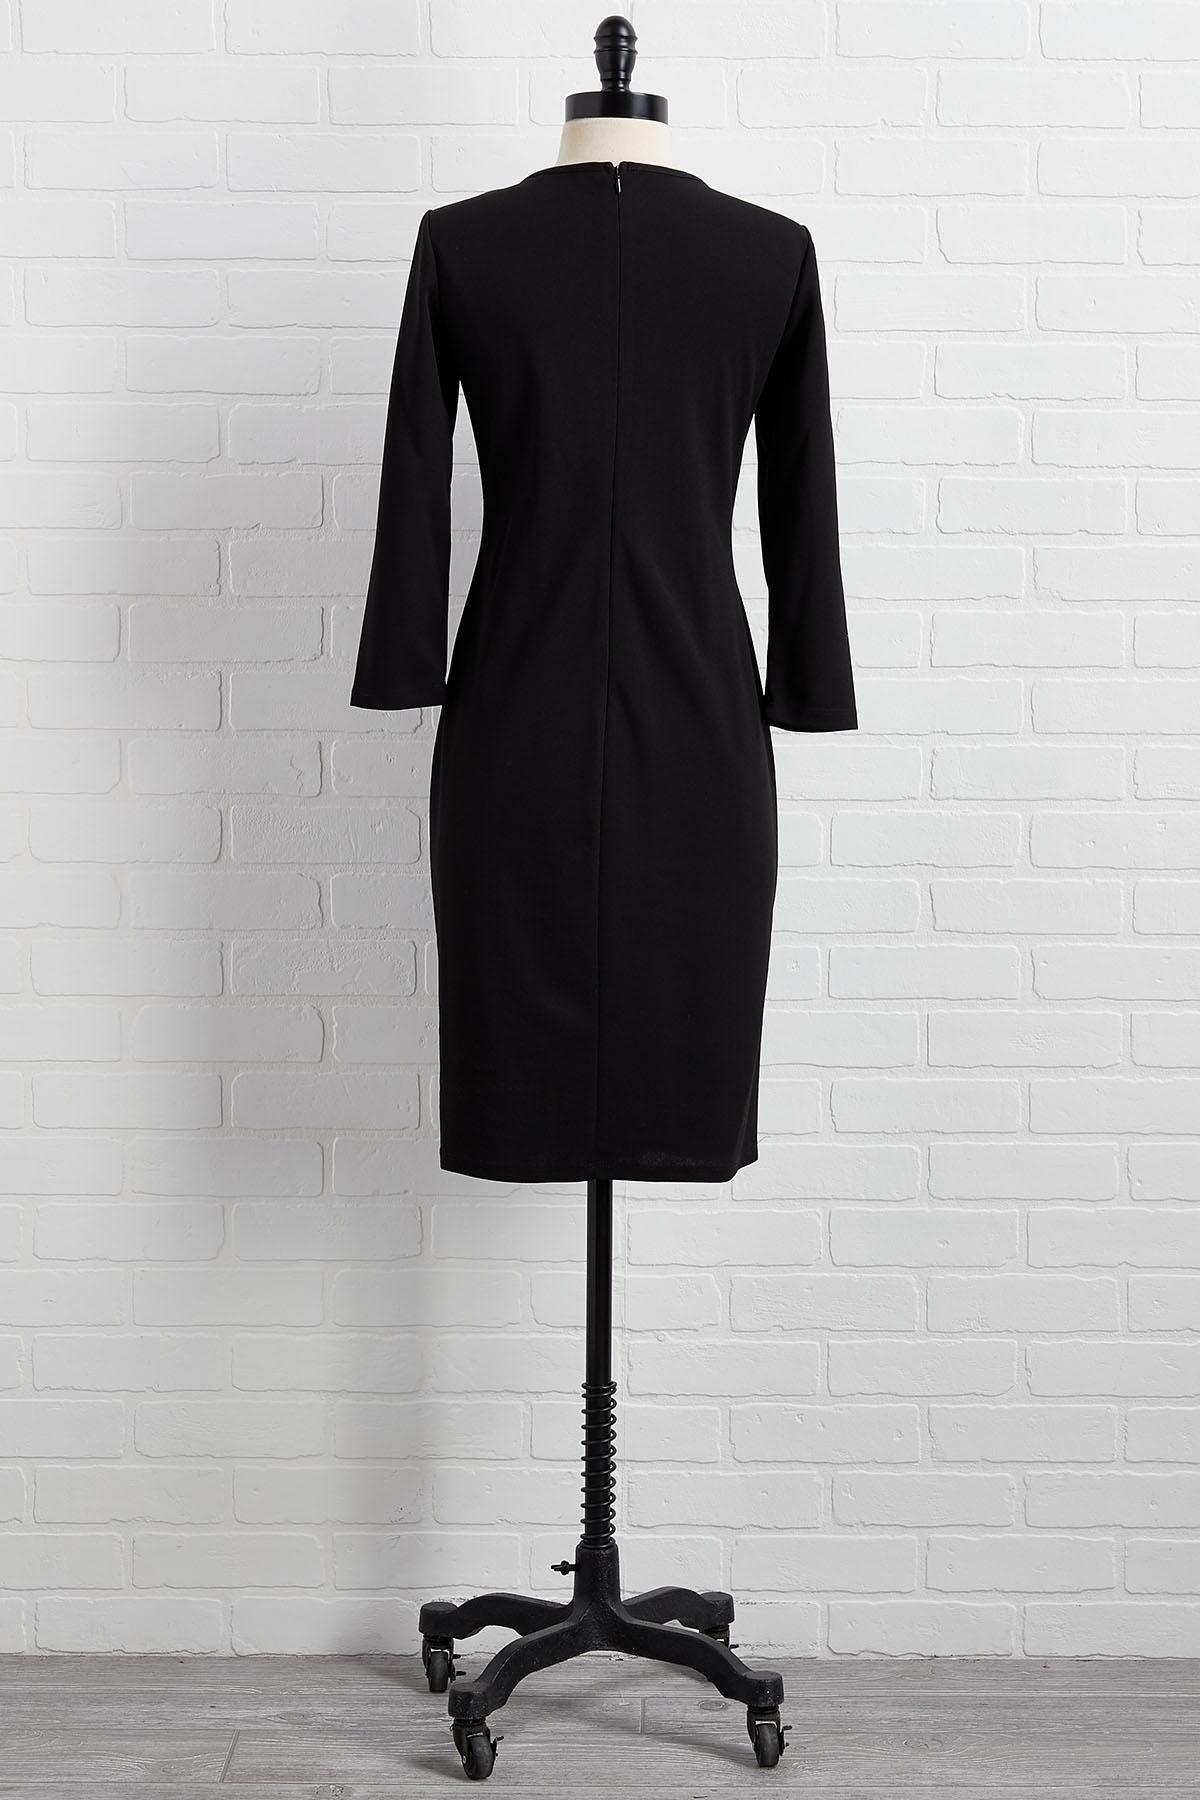 I Spy Square Neck Dress